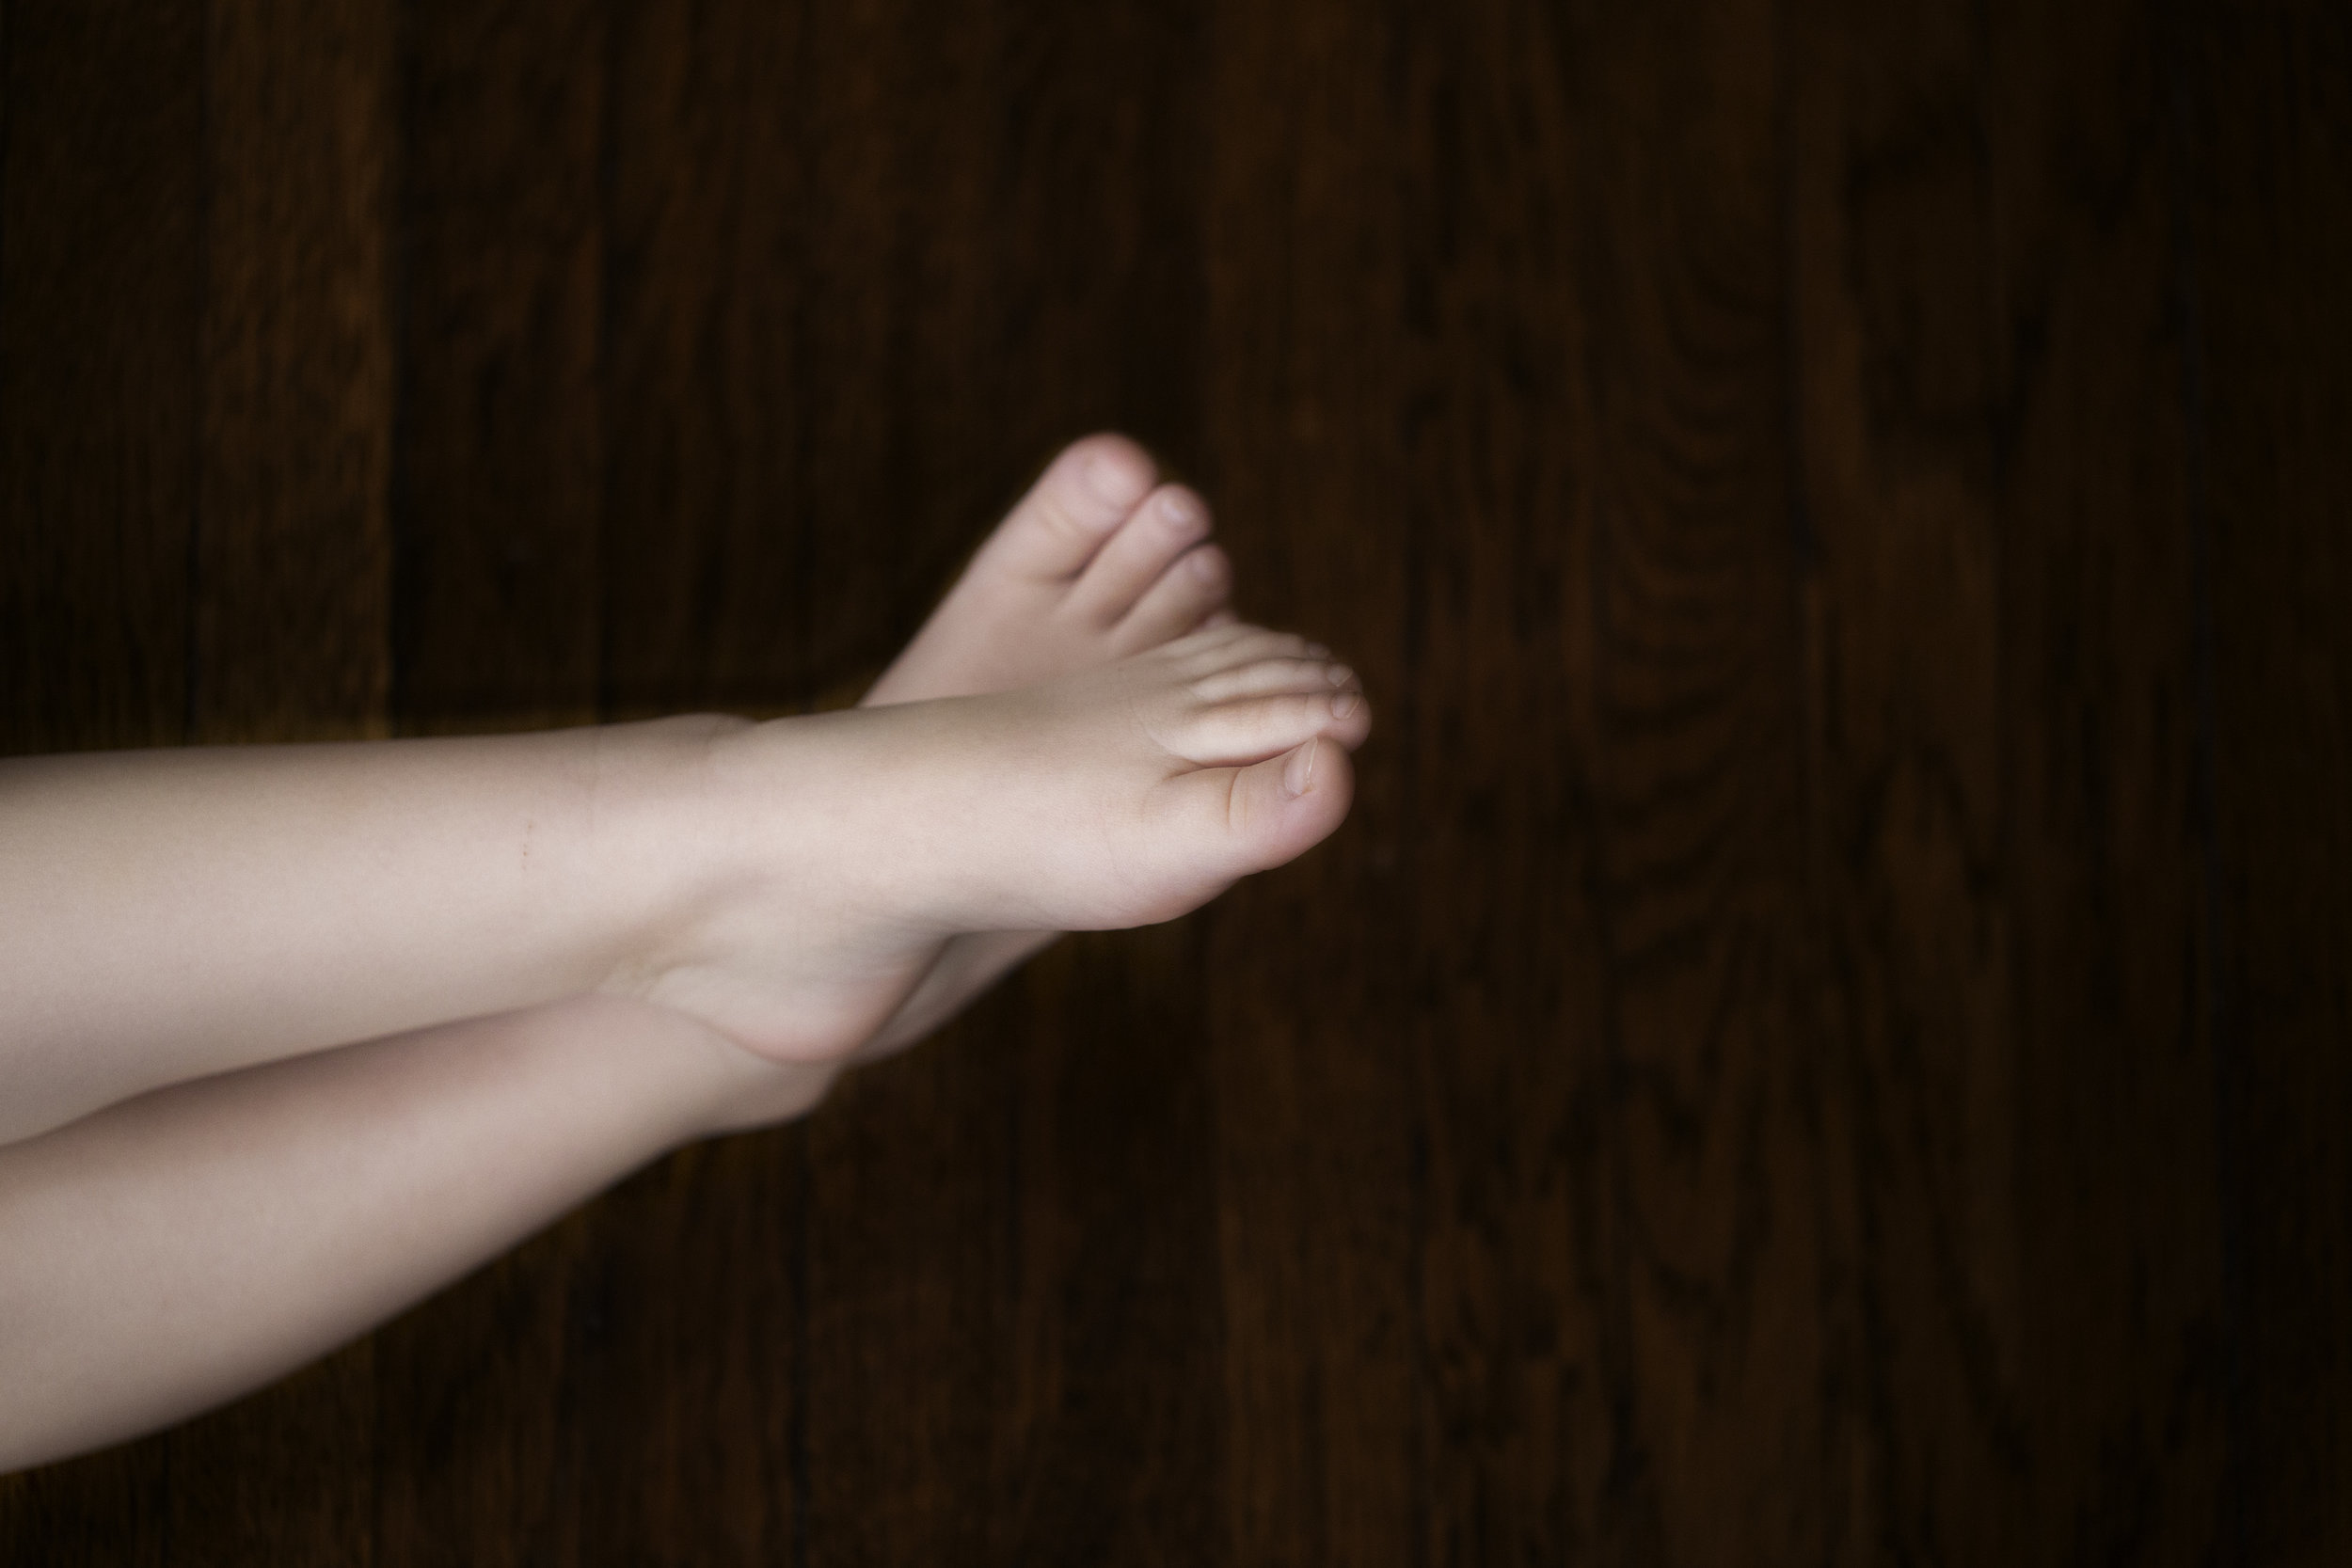 lillia_feet.jpg